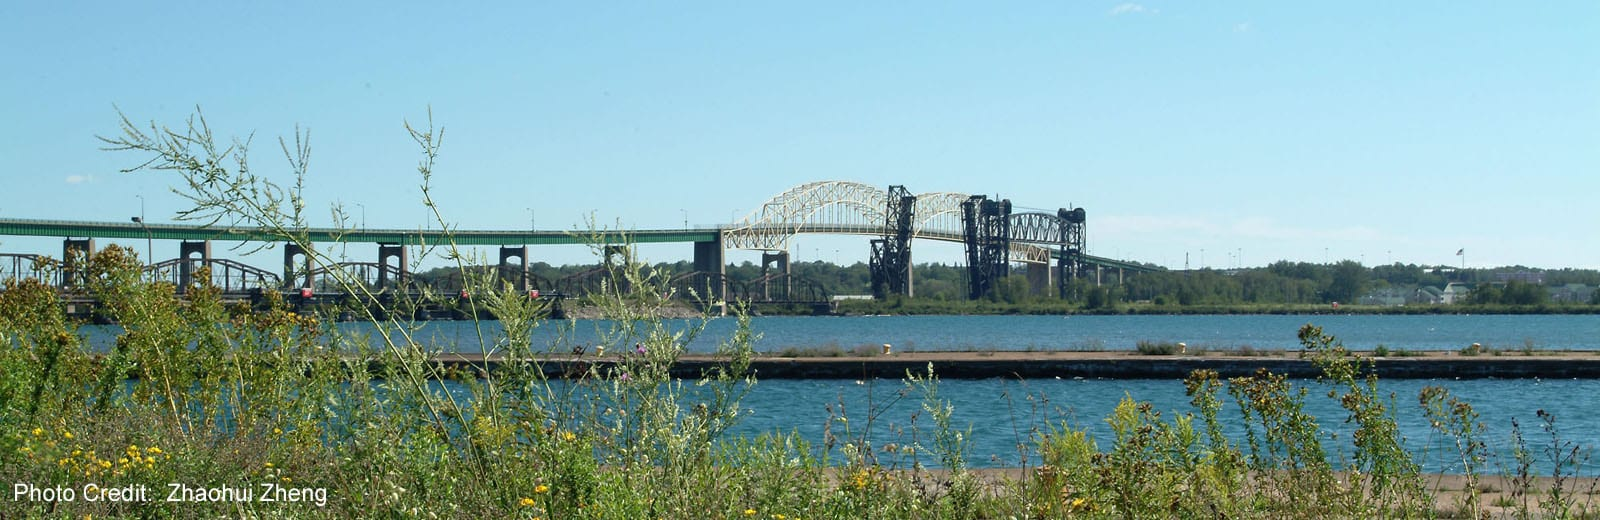 Sault Ste Marie - St.Mary's River & International Bridge-sliver (Zhaohui Zheng)